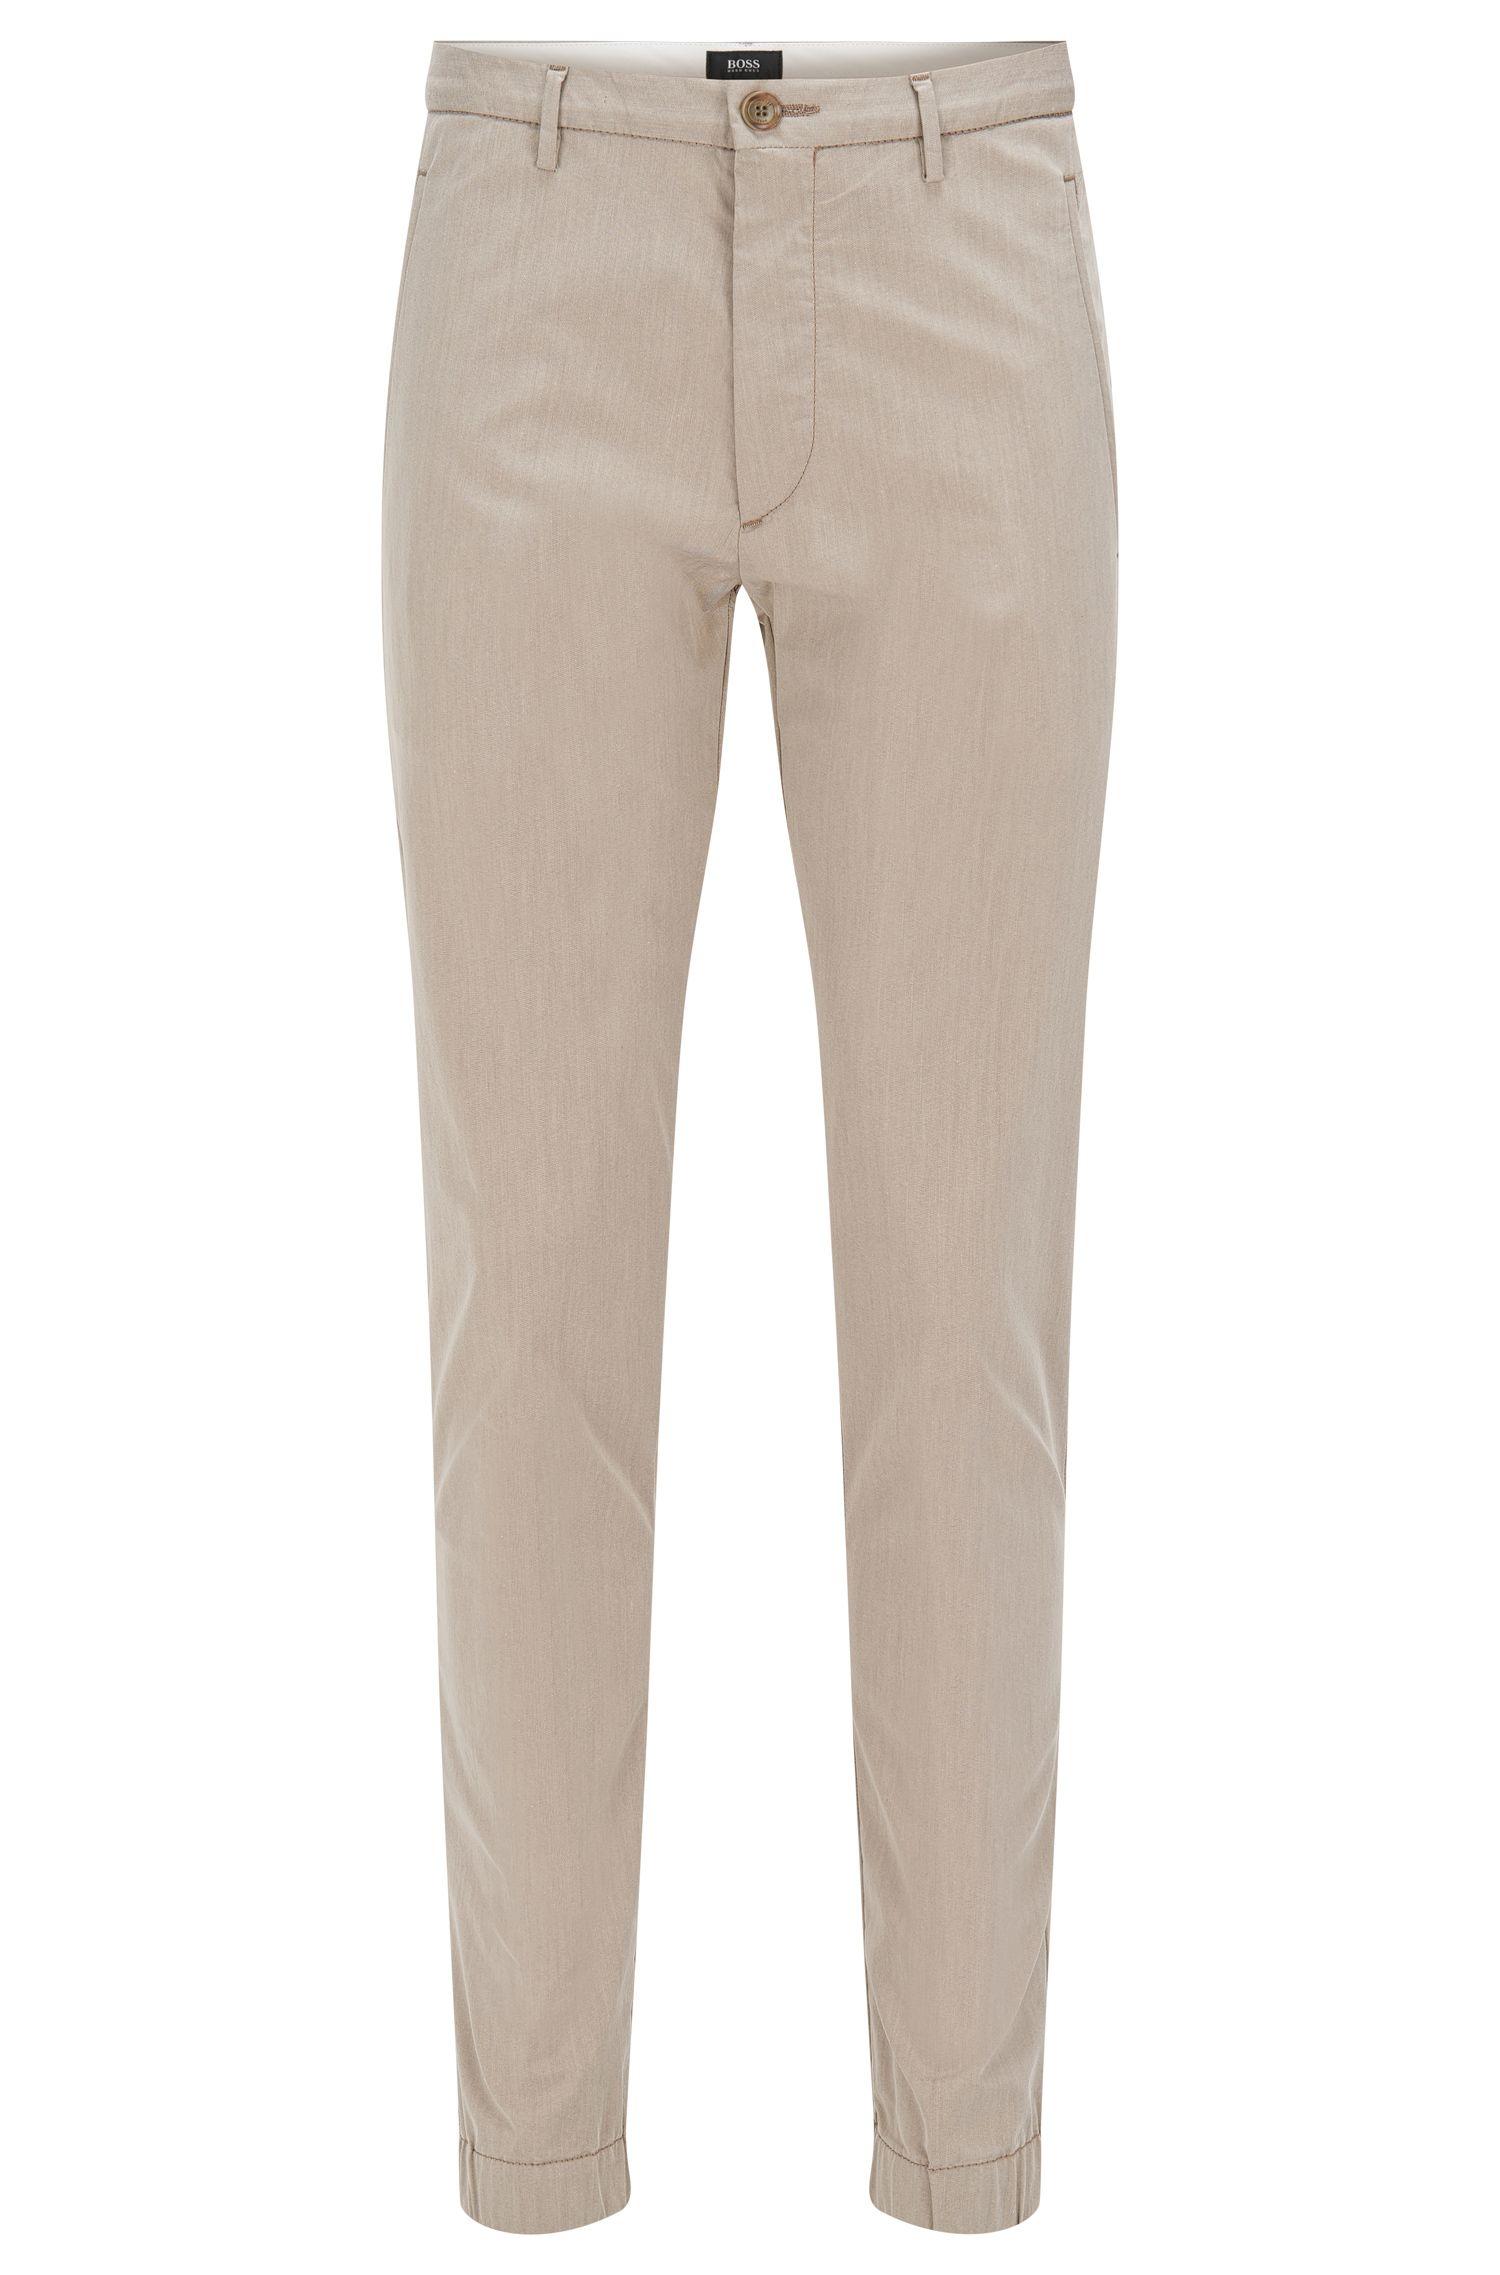 'Kito W'   Regular Fit, Italian Stretch Cotton Blend Trousers